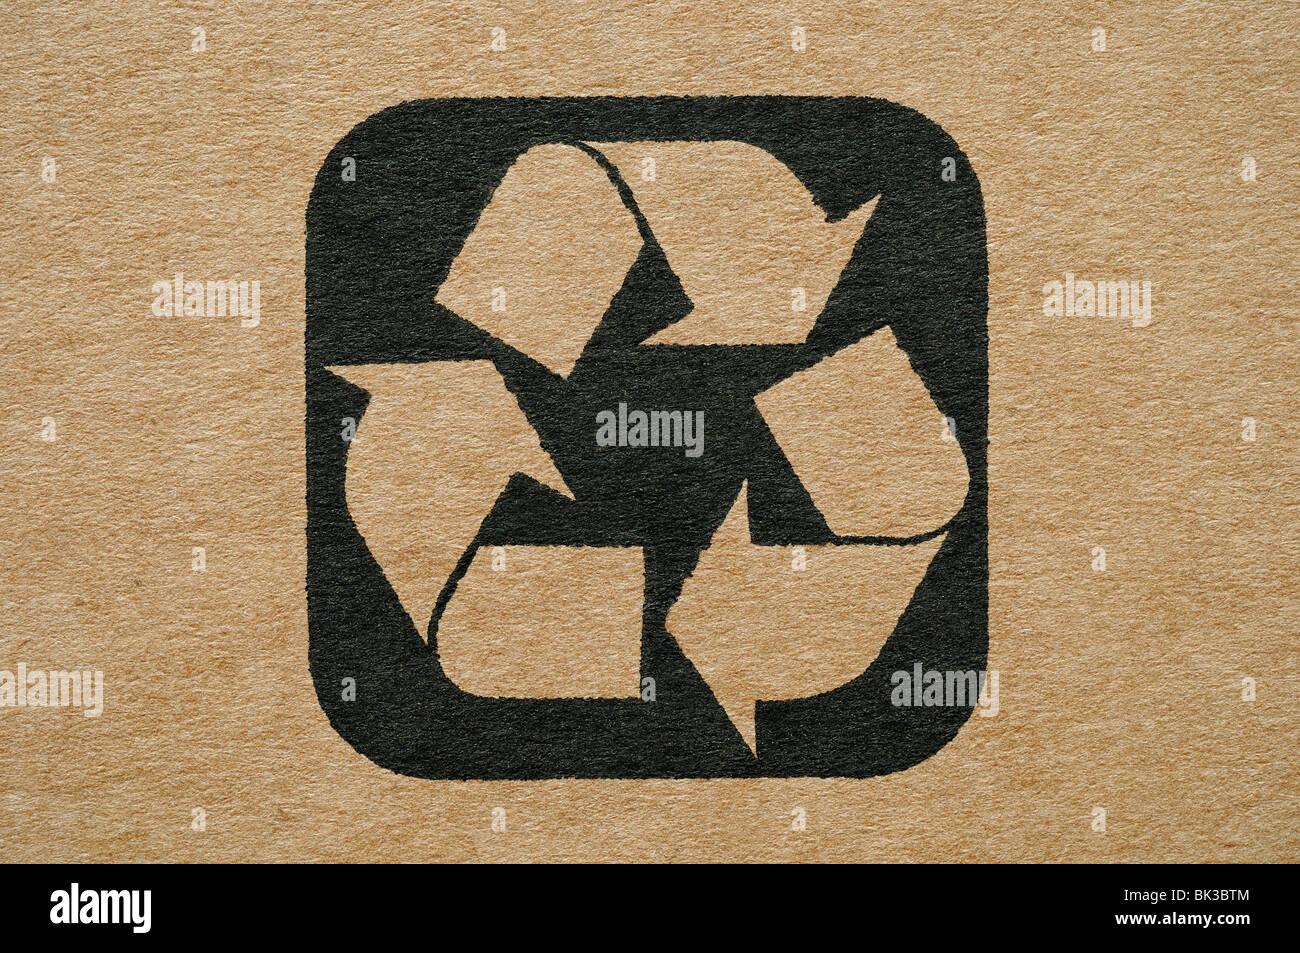 Cardboard Recycling Symbol - Stock Image